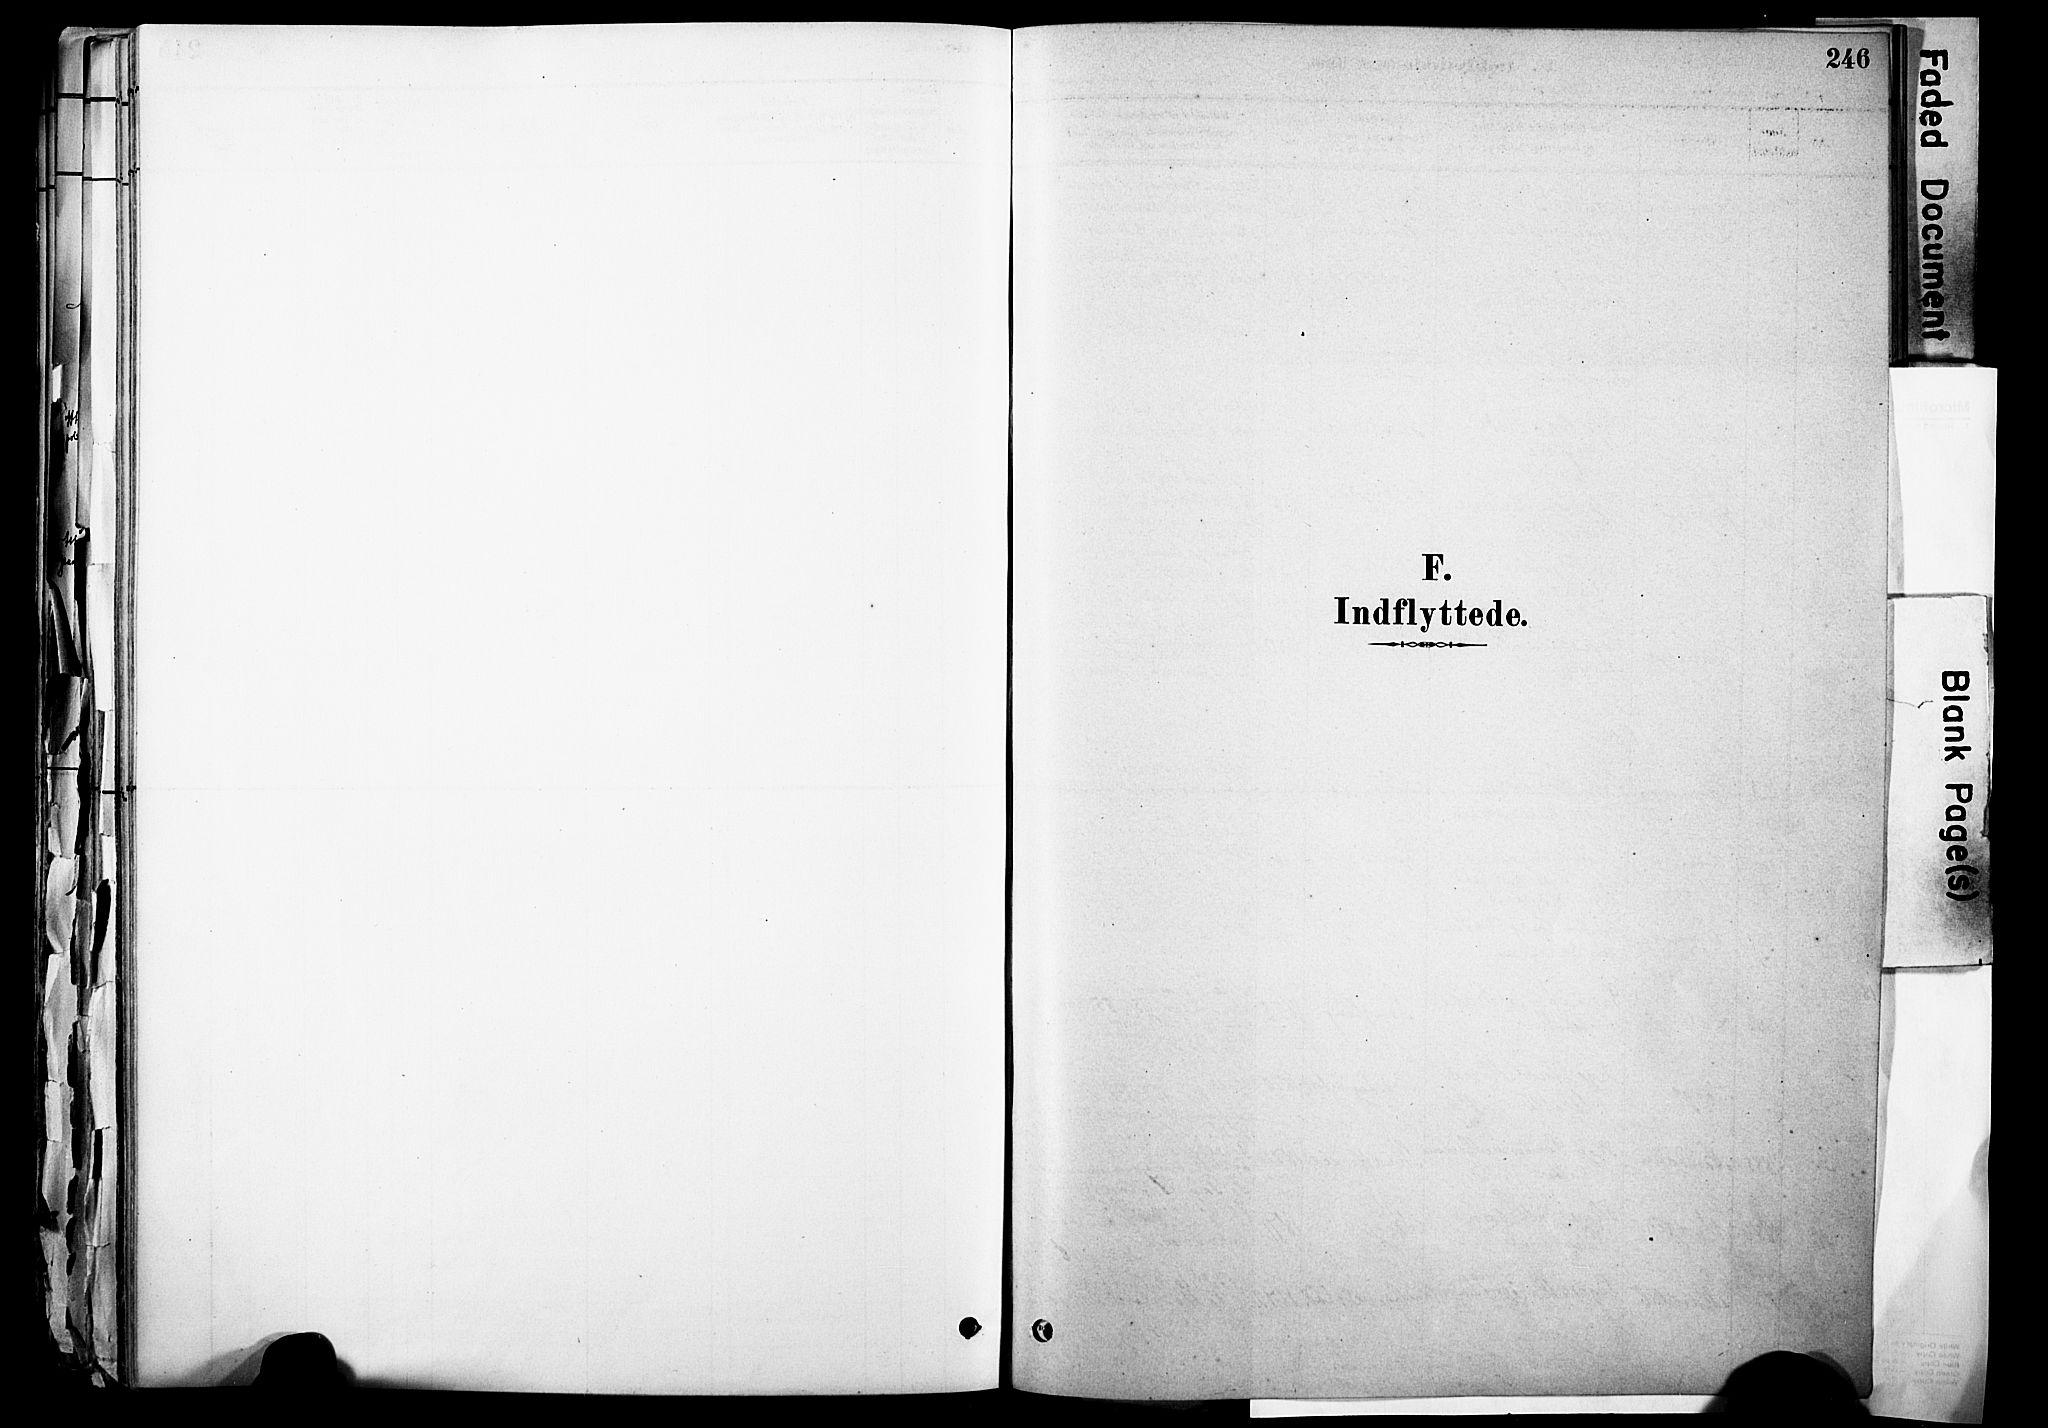 SAH, Skjåk prestekontor, Ministerialbok nr. 3, 1880-1907, s. 246